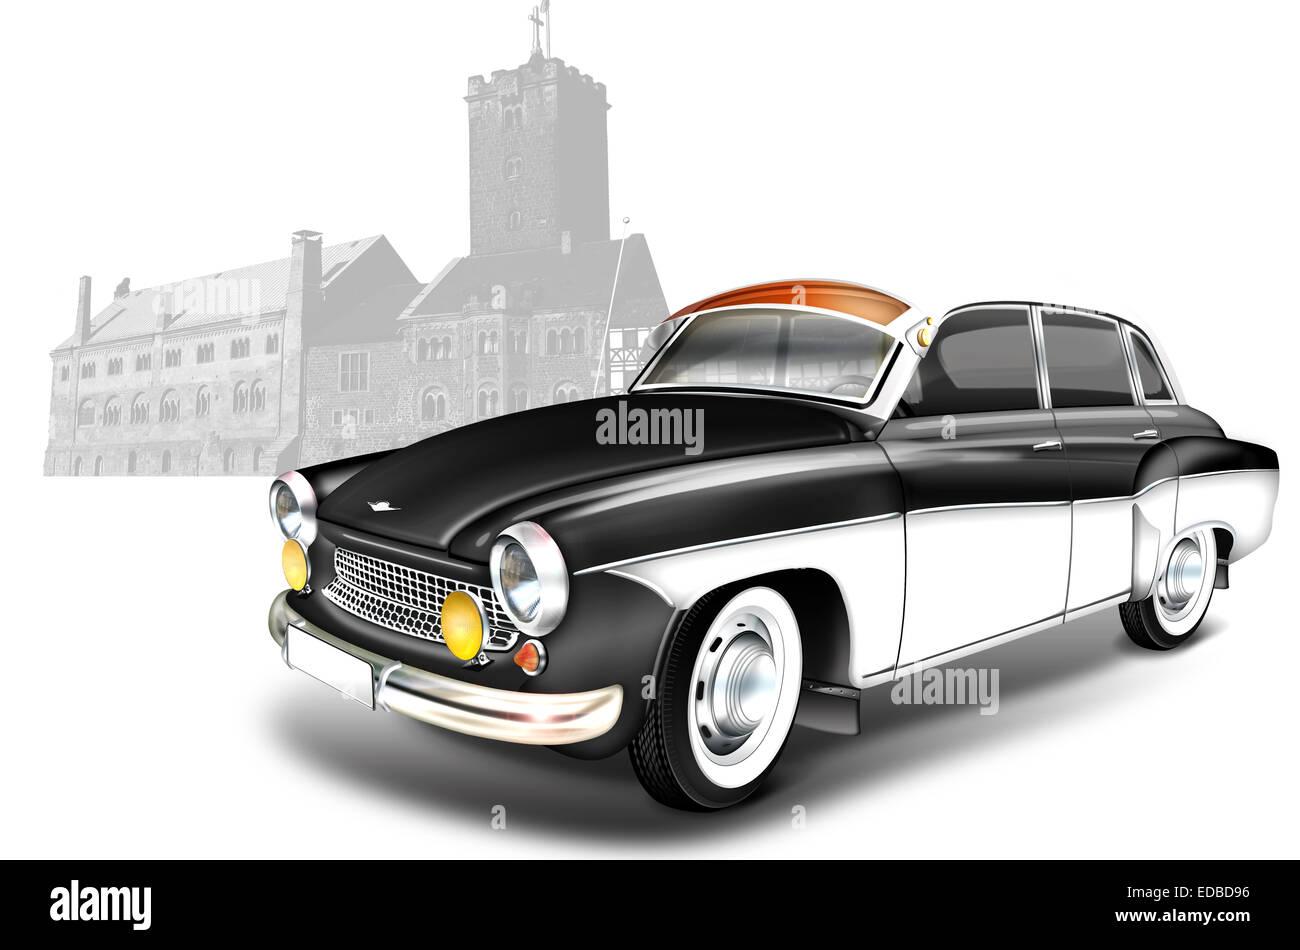 DDR vintage car from the 60s, Wartburg 311, Illustration - Stock Image